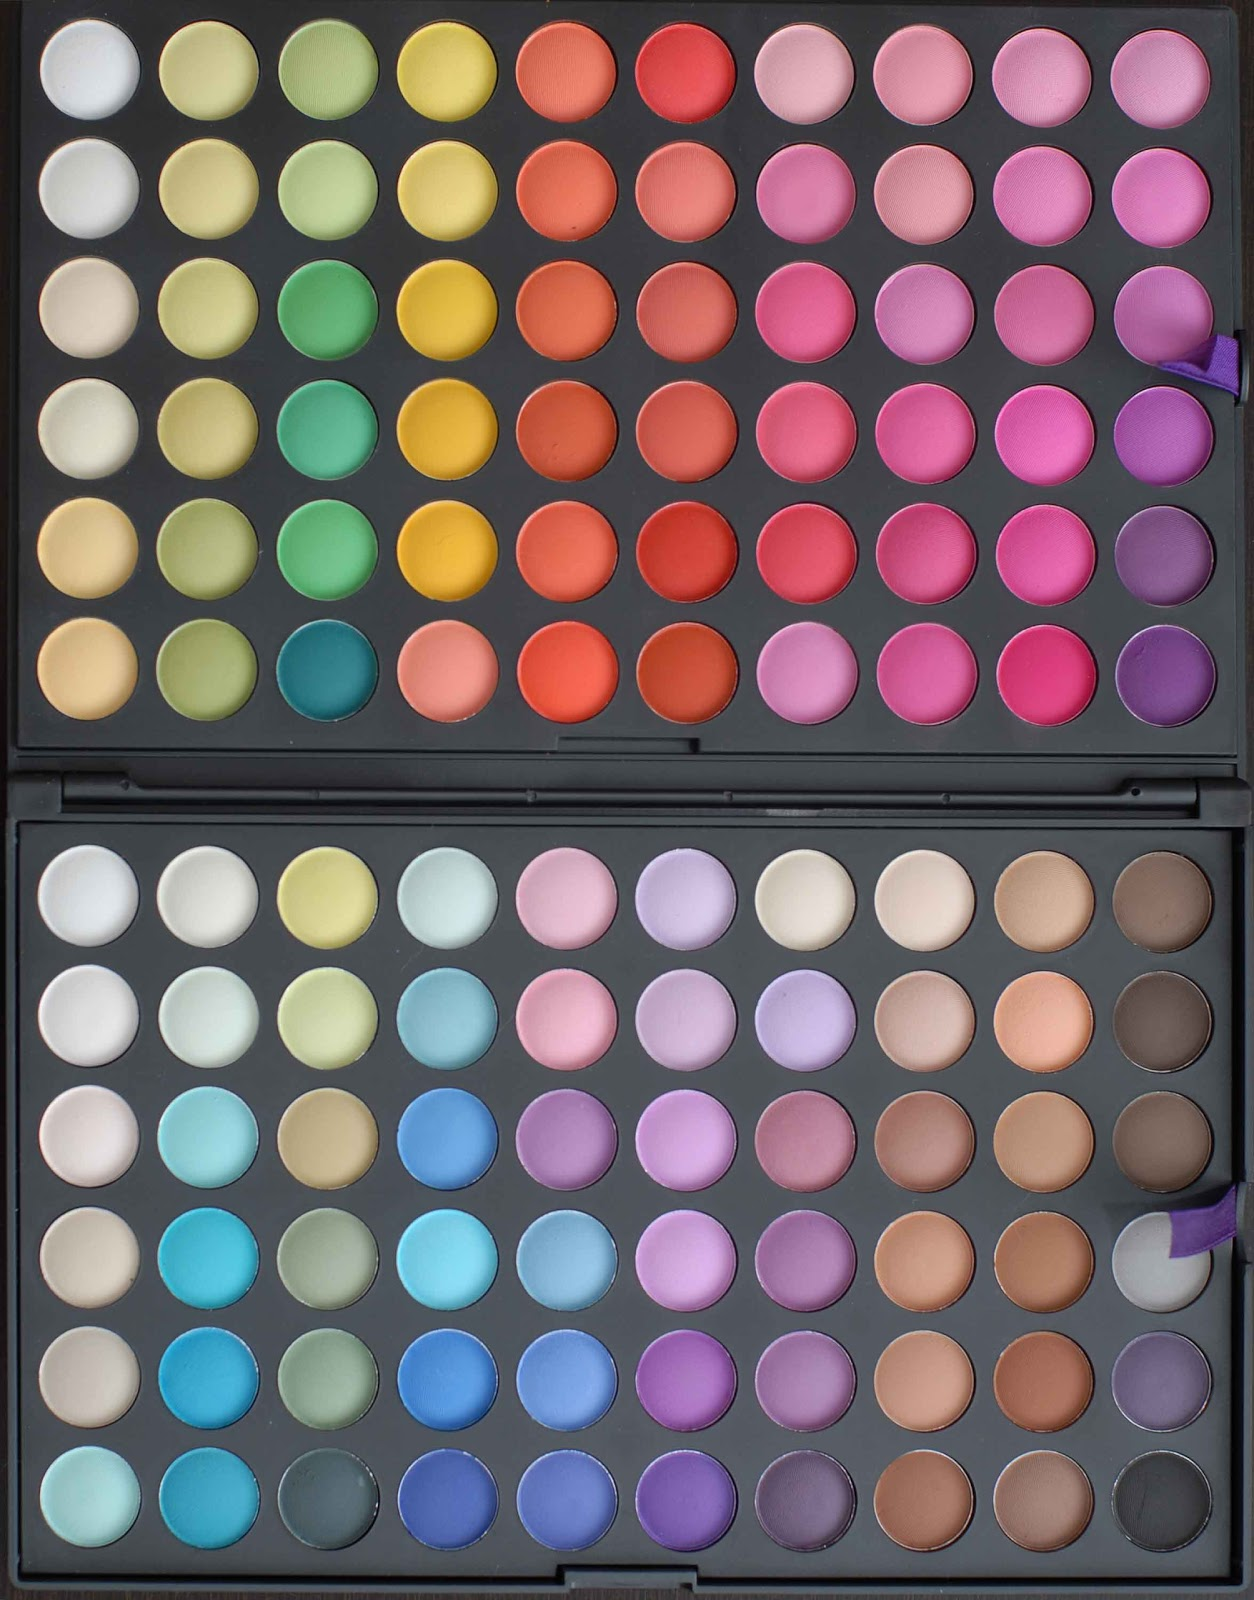 trusa farduri profesionale 120 culori mate